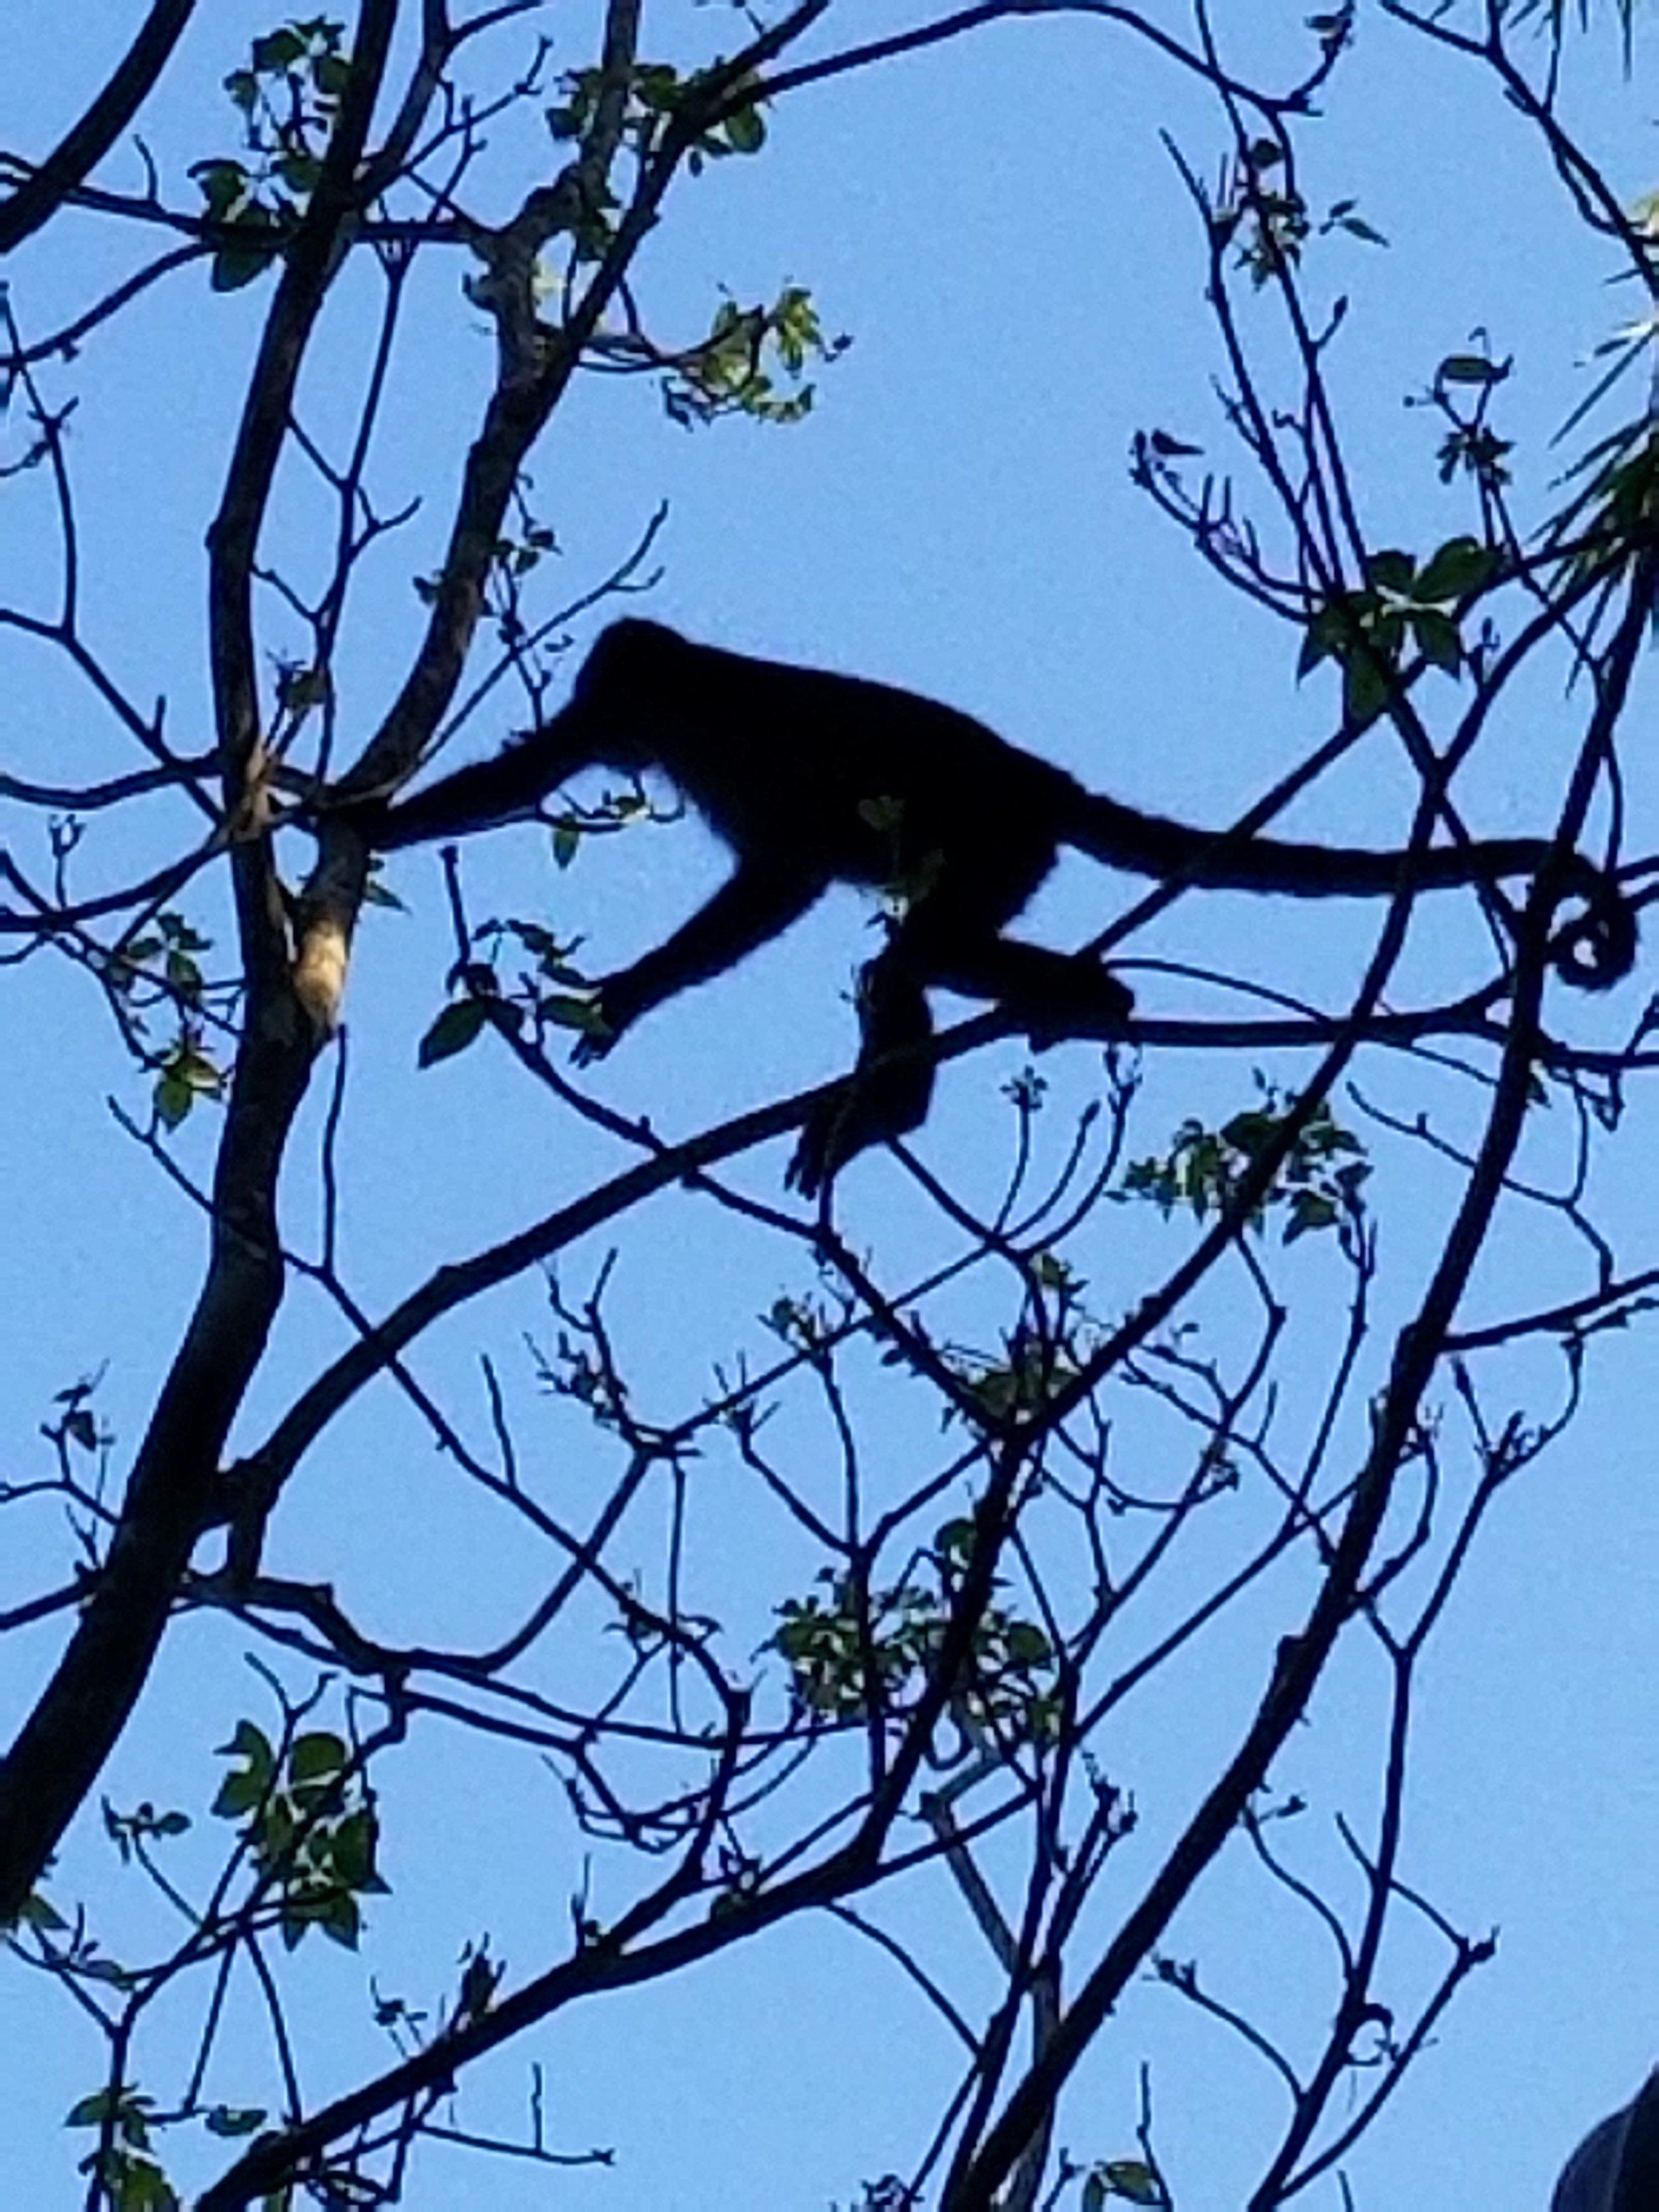 One of the howler monkeys